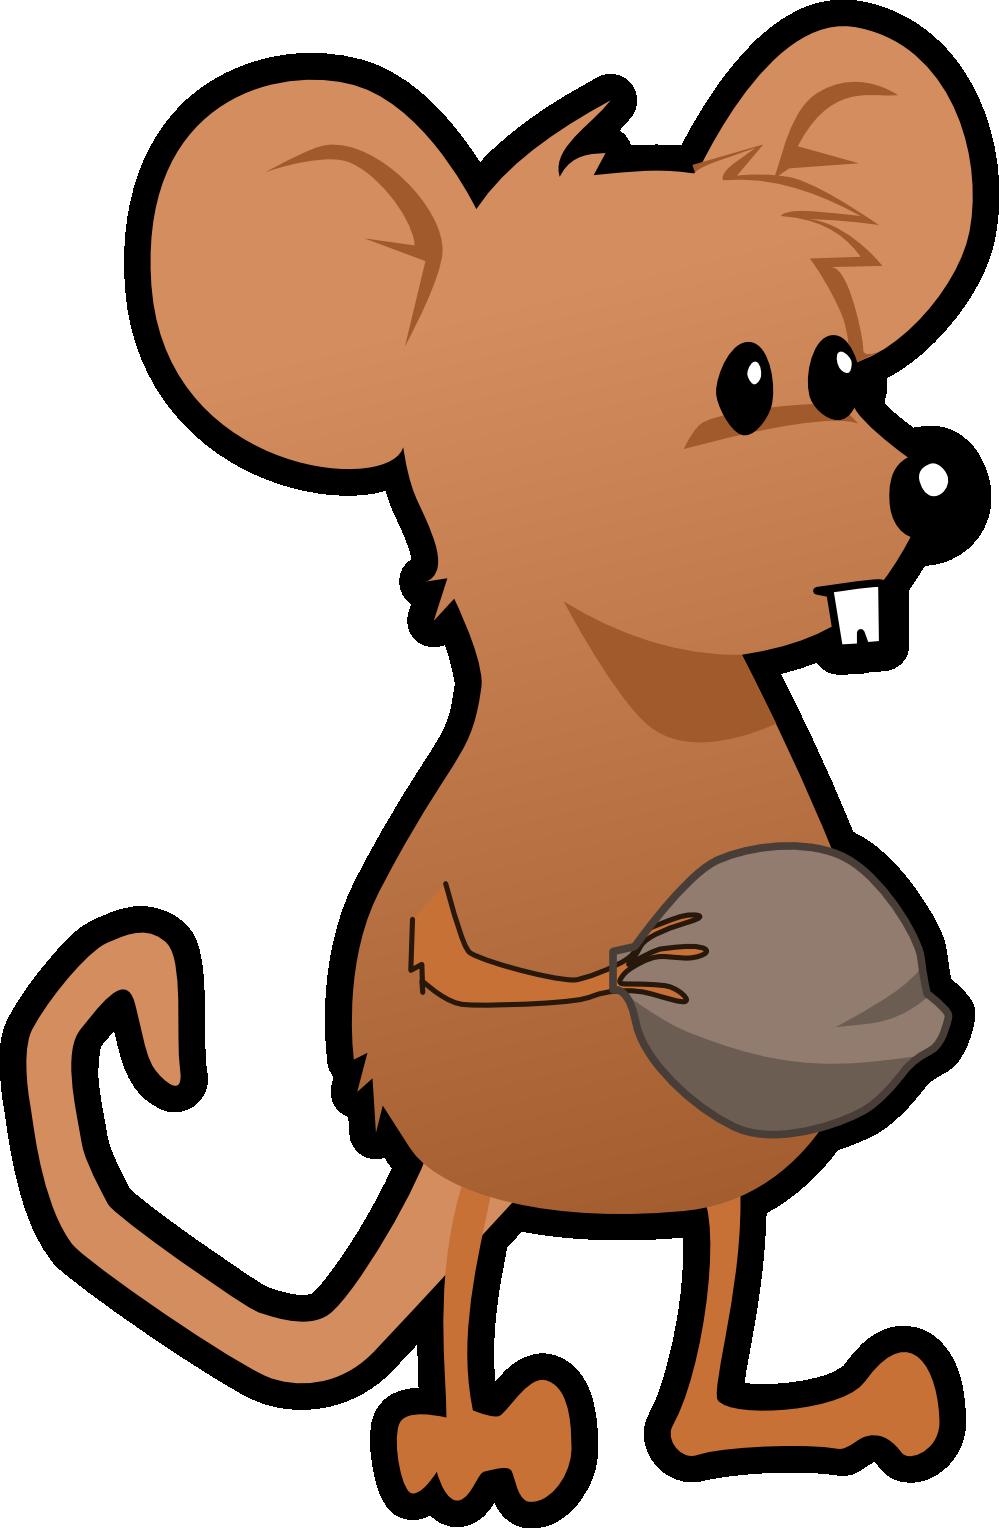 Free Rat Cliparts, Download Free Clip Art, Free Clip Art on.